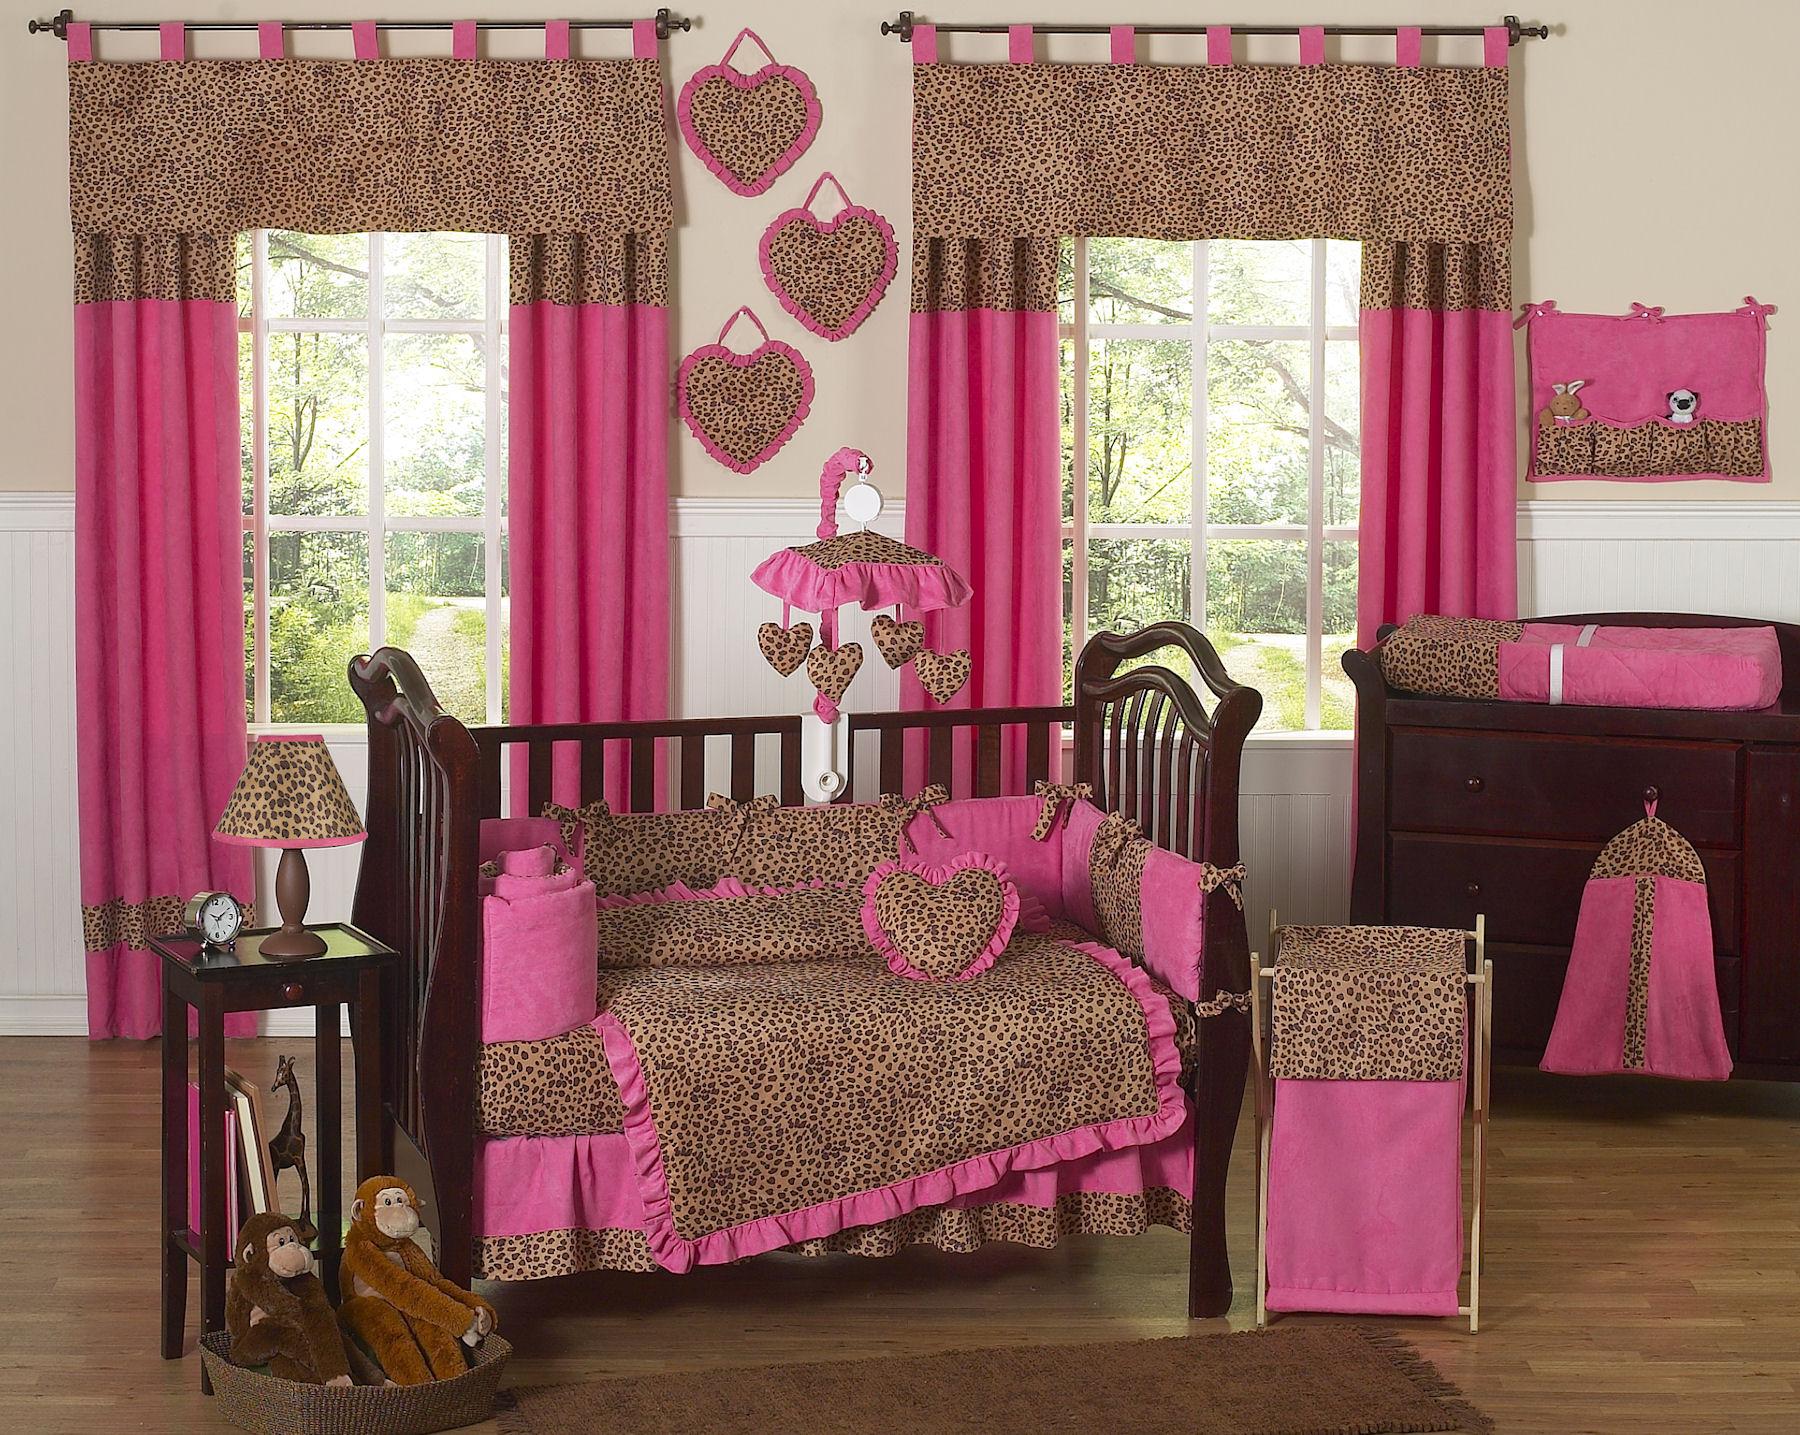 Free download Leopard Print Wallpaper For Bedroom Pink ...